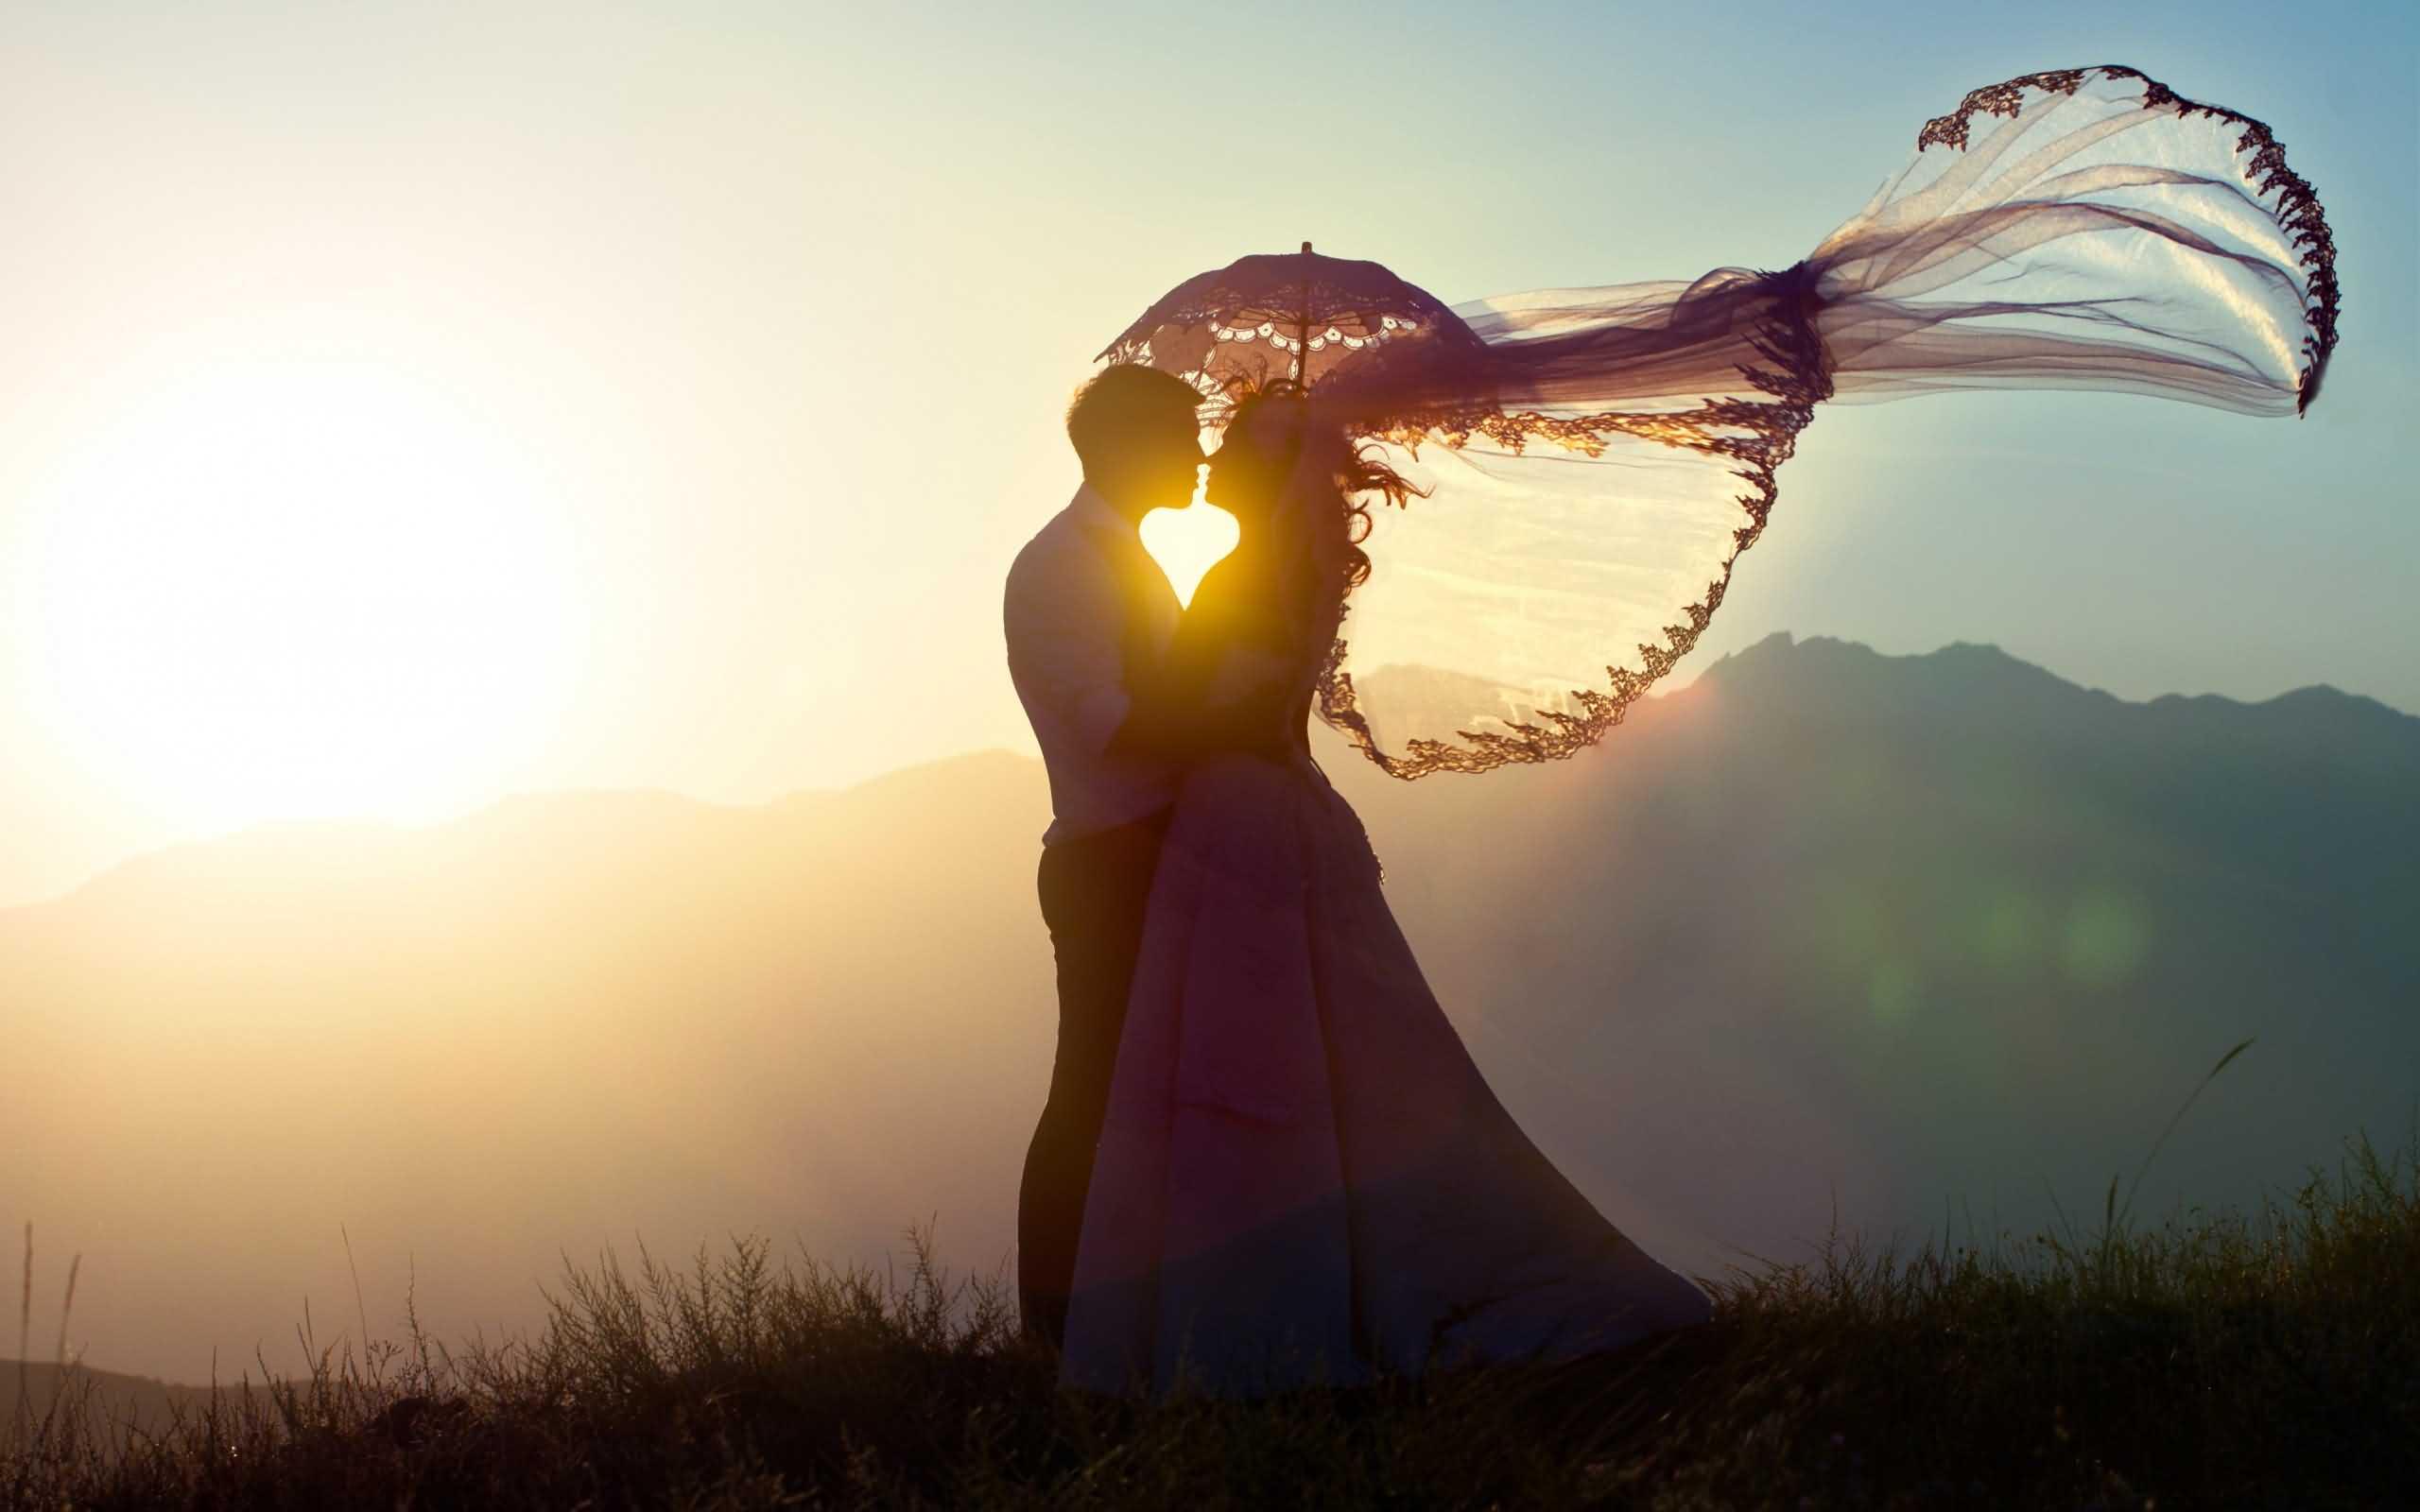 Sunset Wedding Couple Wallpaper